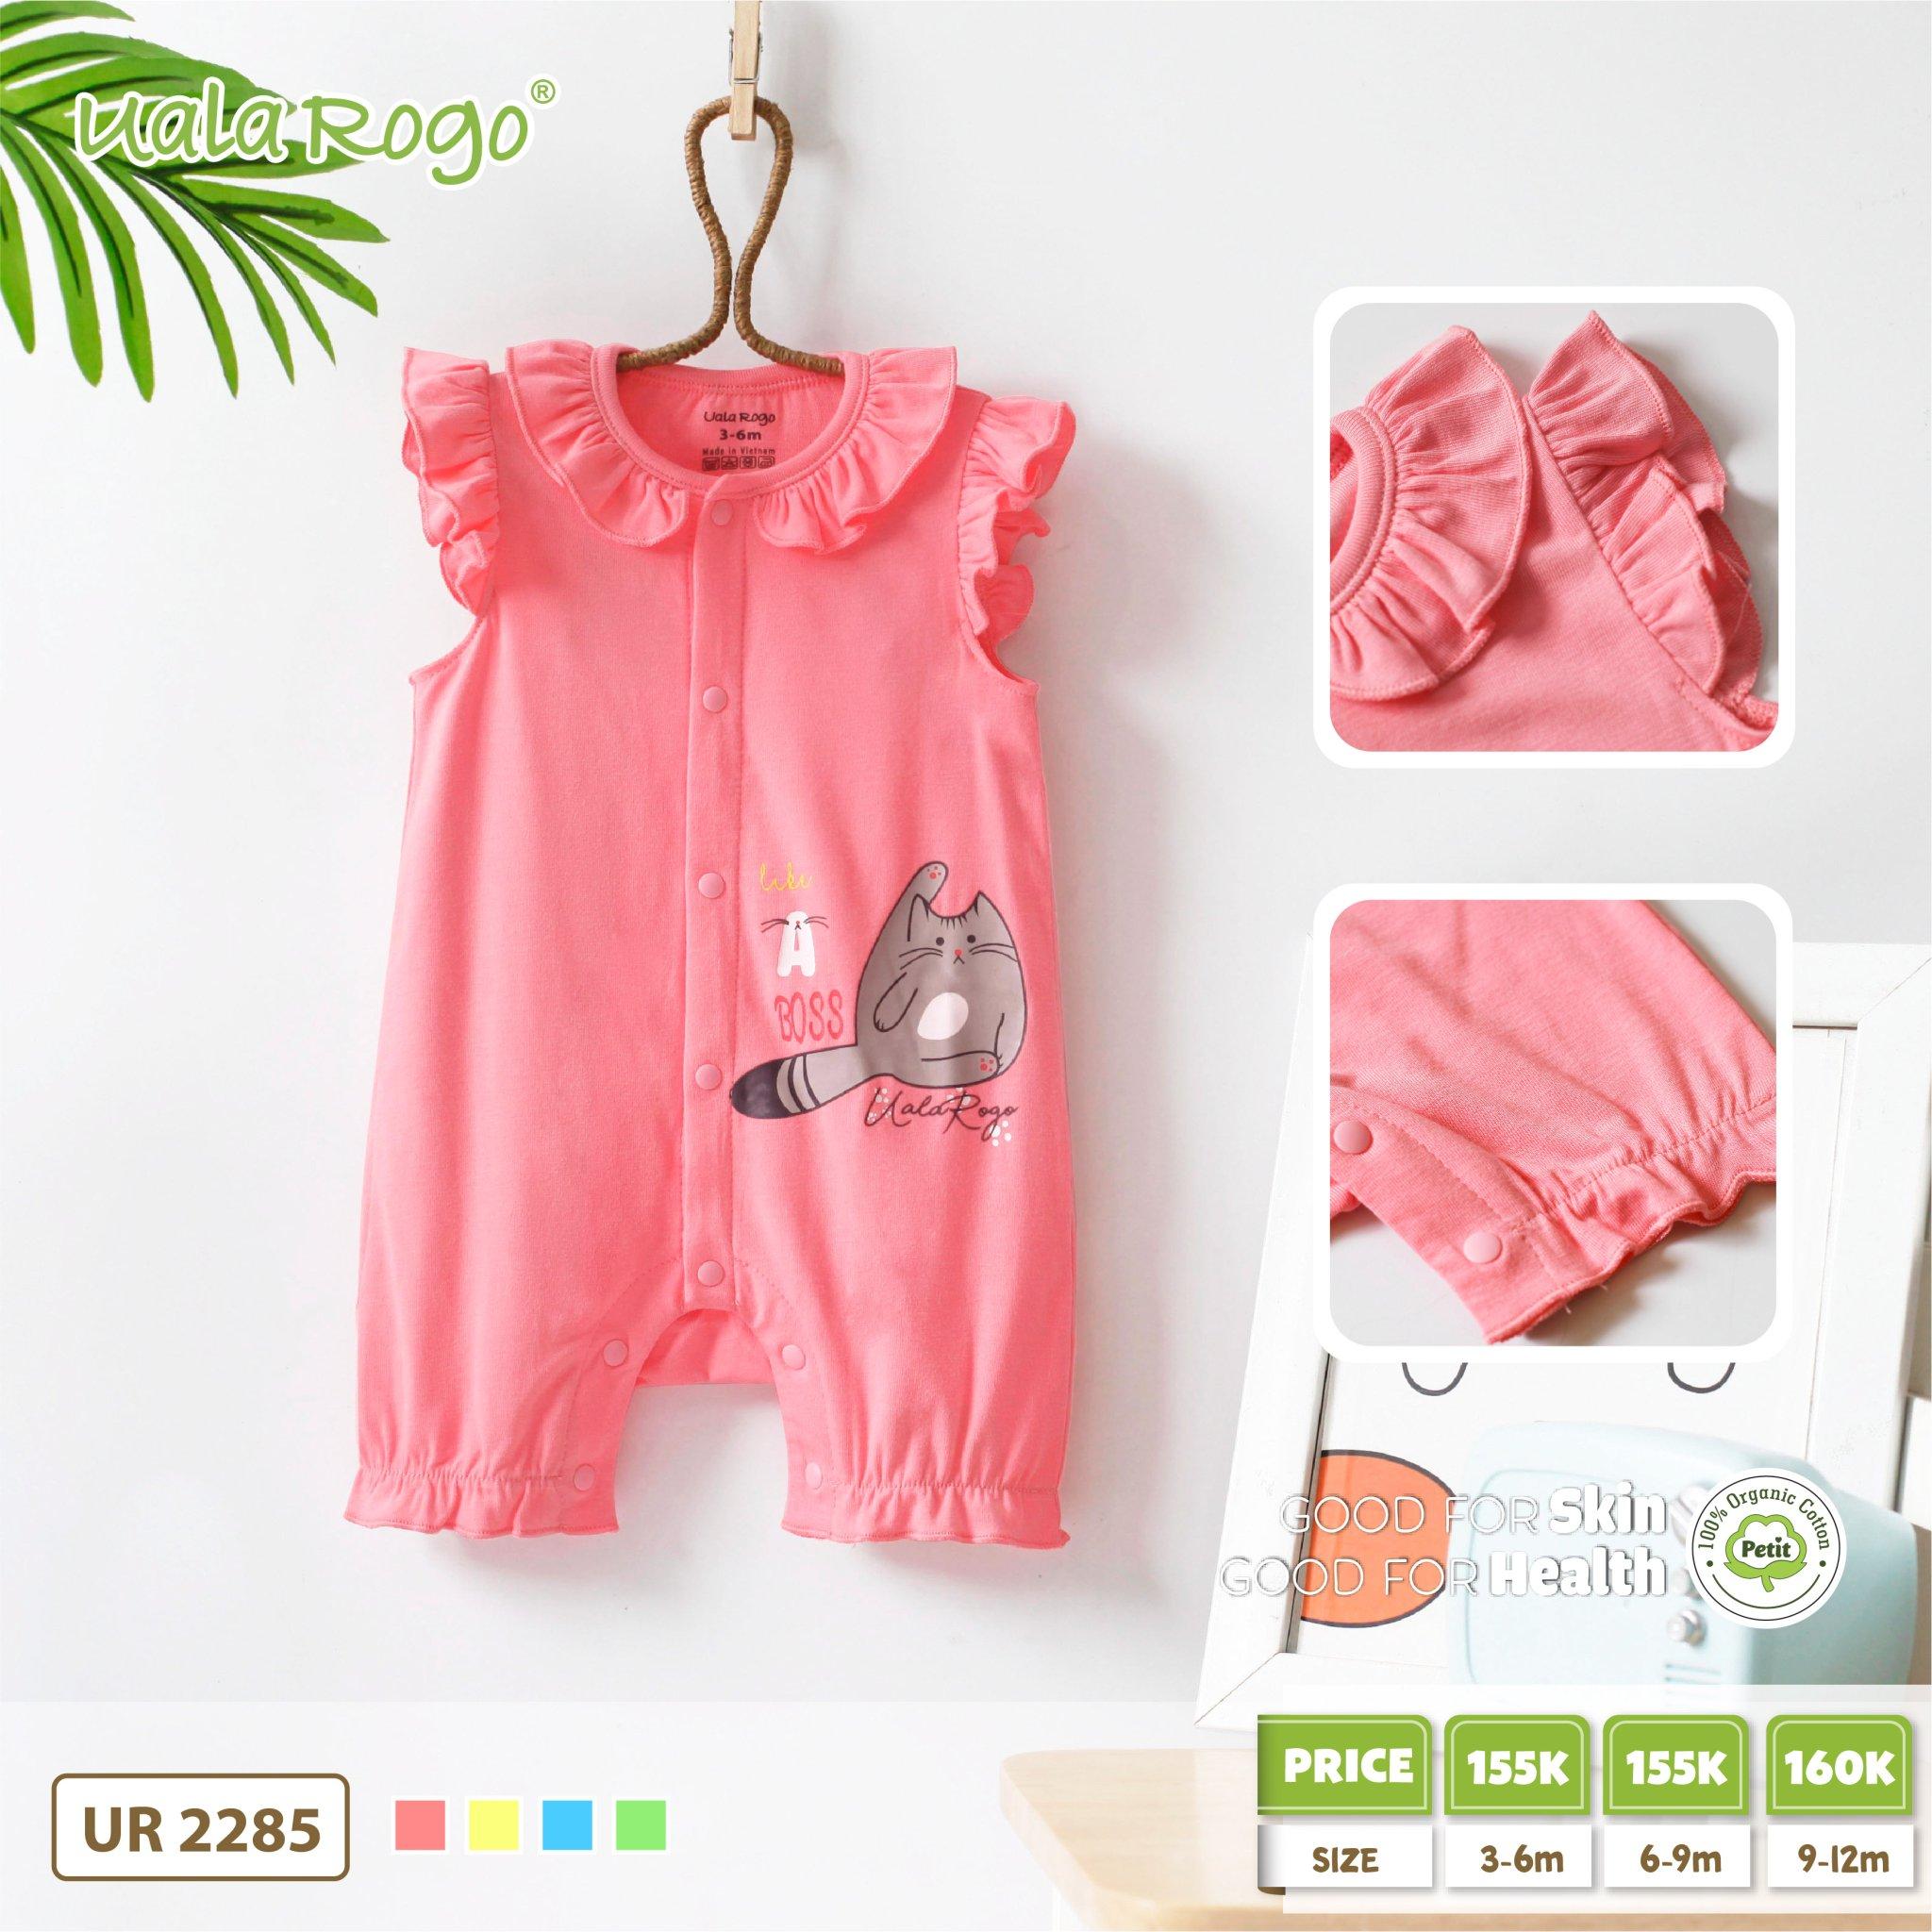 UR2285.1- Set body vải Petit mèo hồng Uala Rogo